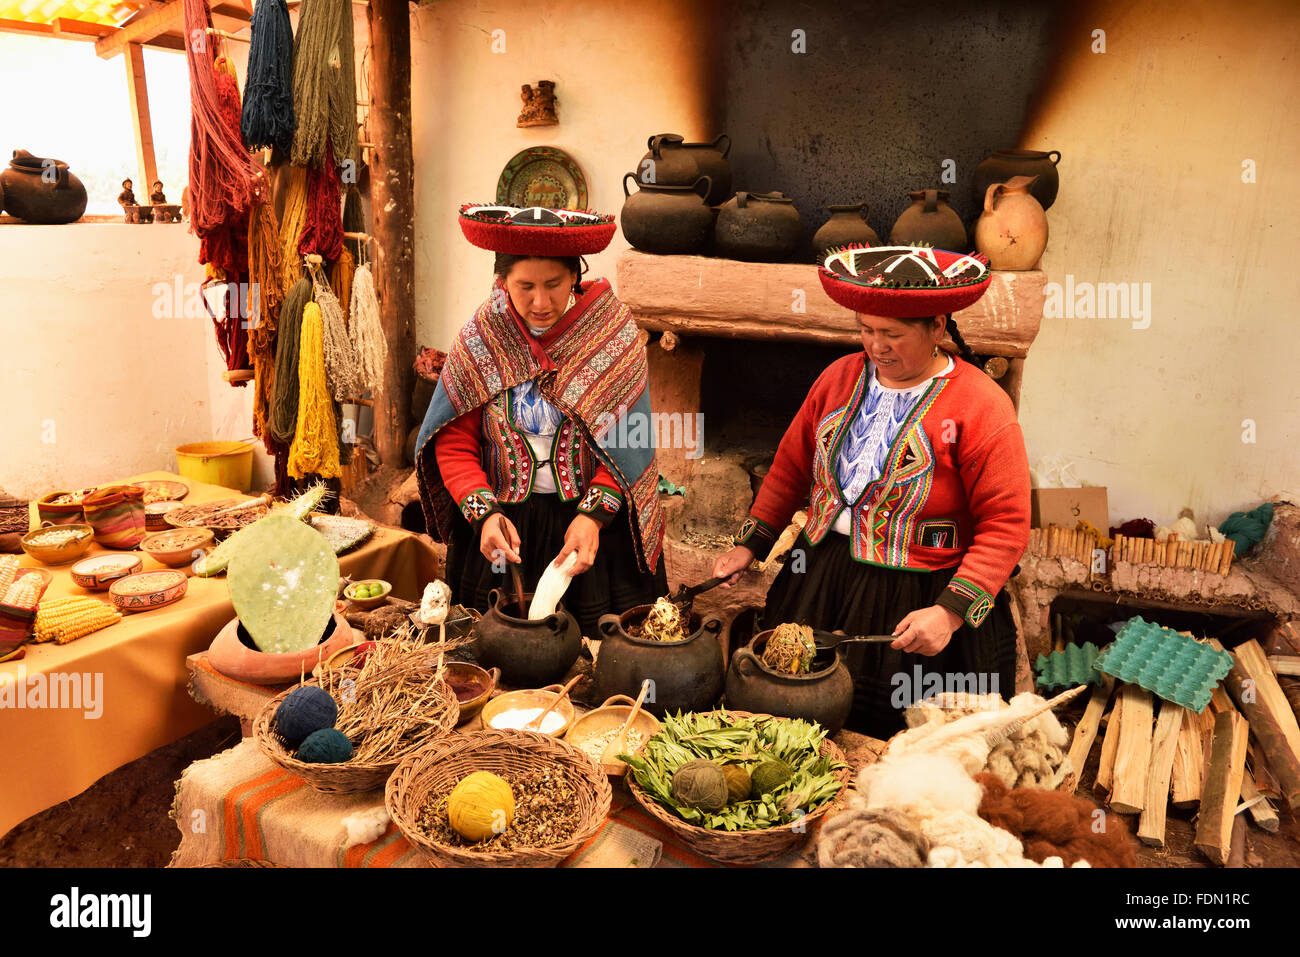 Two Peruvians, traditional alpaca wool dyeing, Chinchero, Cusco Province, Peru Stock Photo